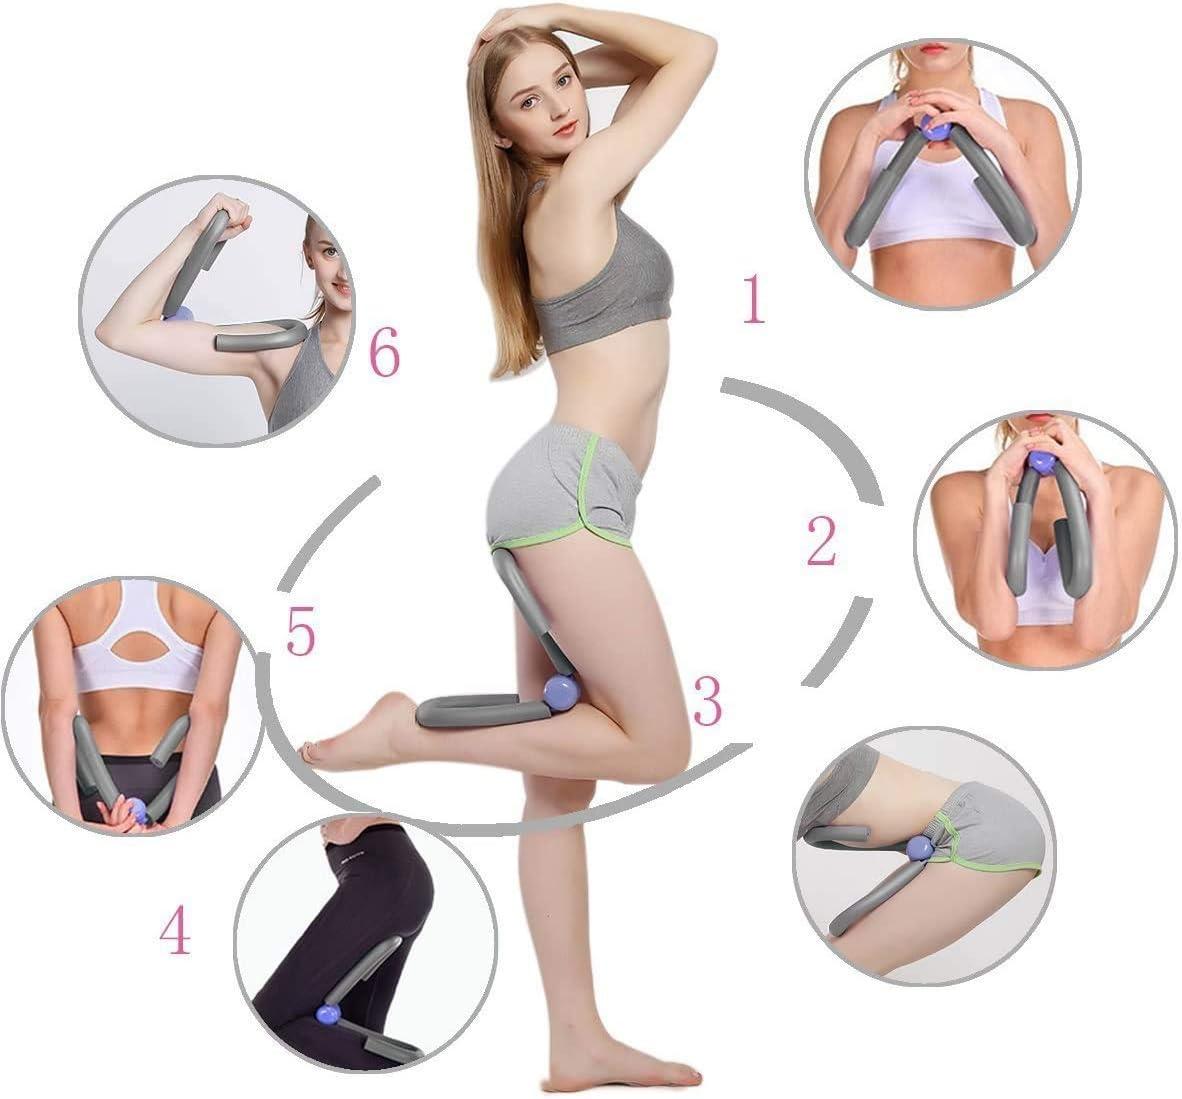 Thigh Toner Leg Exerciser Thigh Trimmer Exerciser Butt Arm Leg Muscle Home Sport Equipment GHINNY Thigh Master Inner and Outer